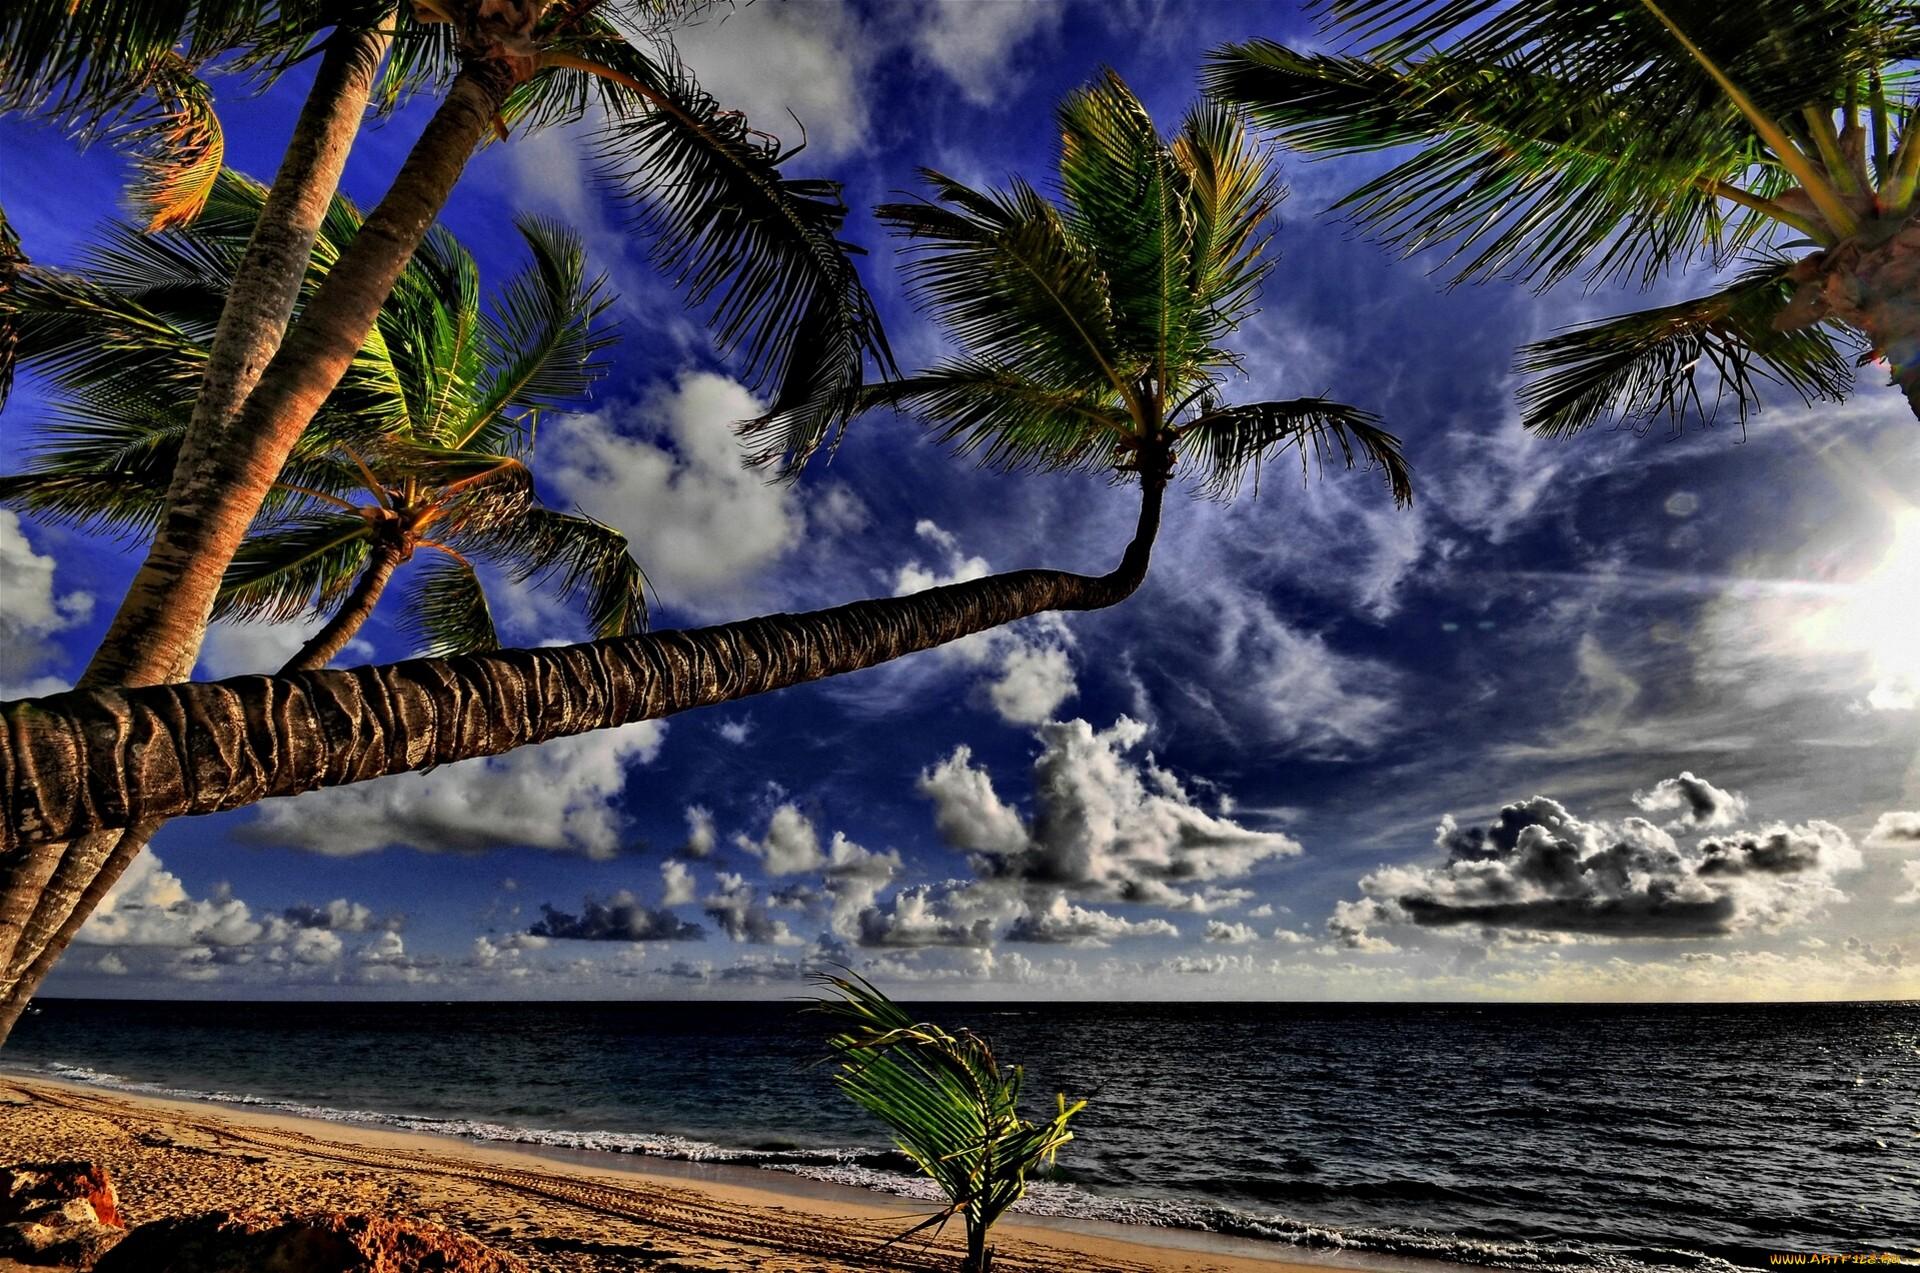 Palm Tree Iphone Wallpaper Palmier Full Hd Fond D 233 Cran And Arri 232 Re Plan 1920x1273